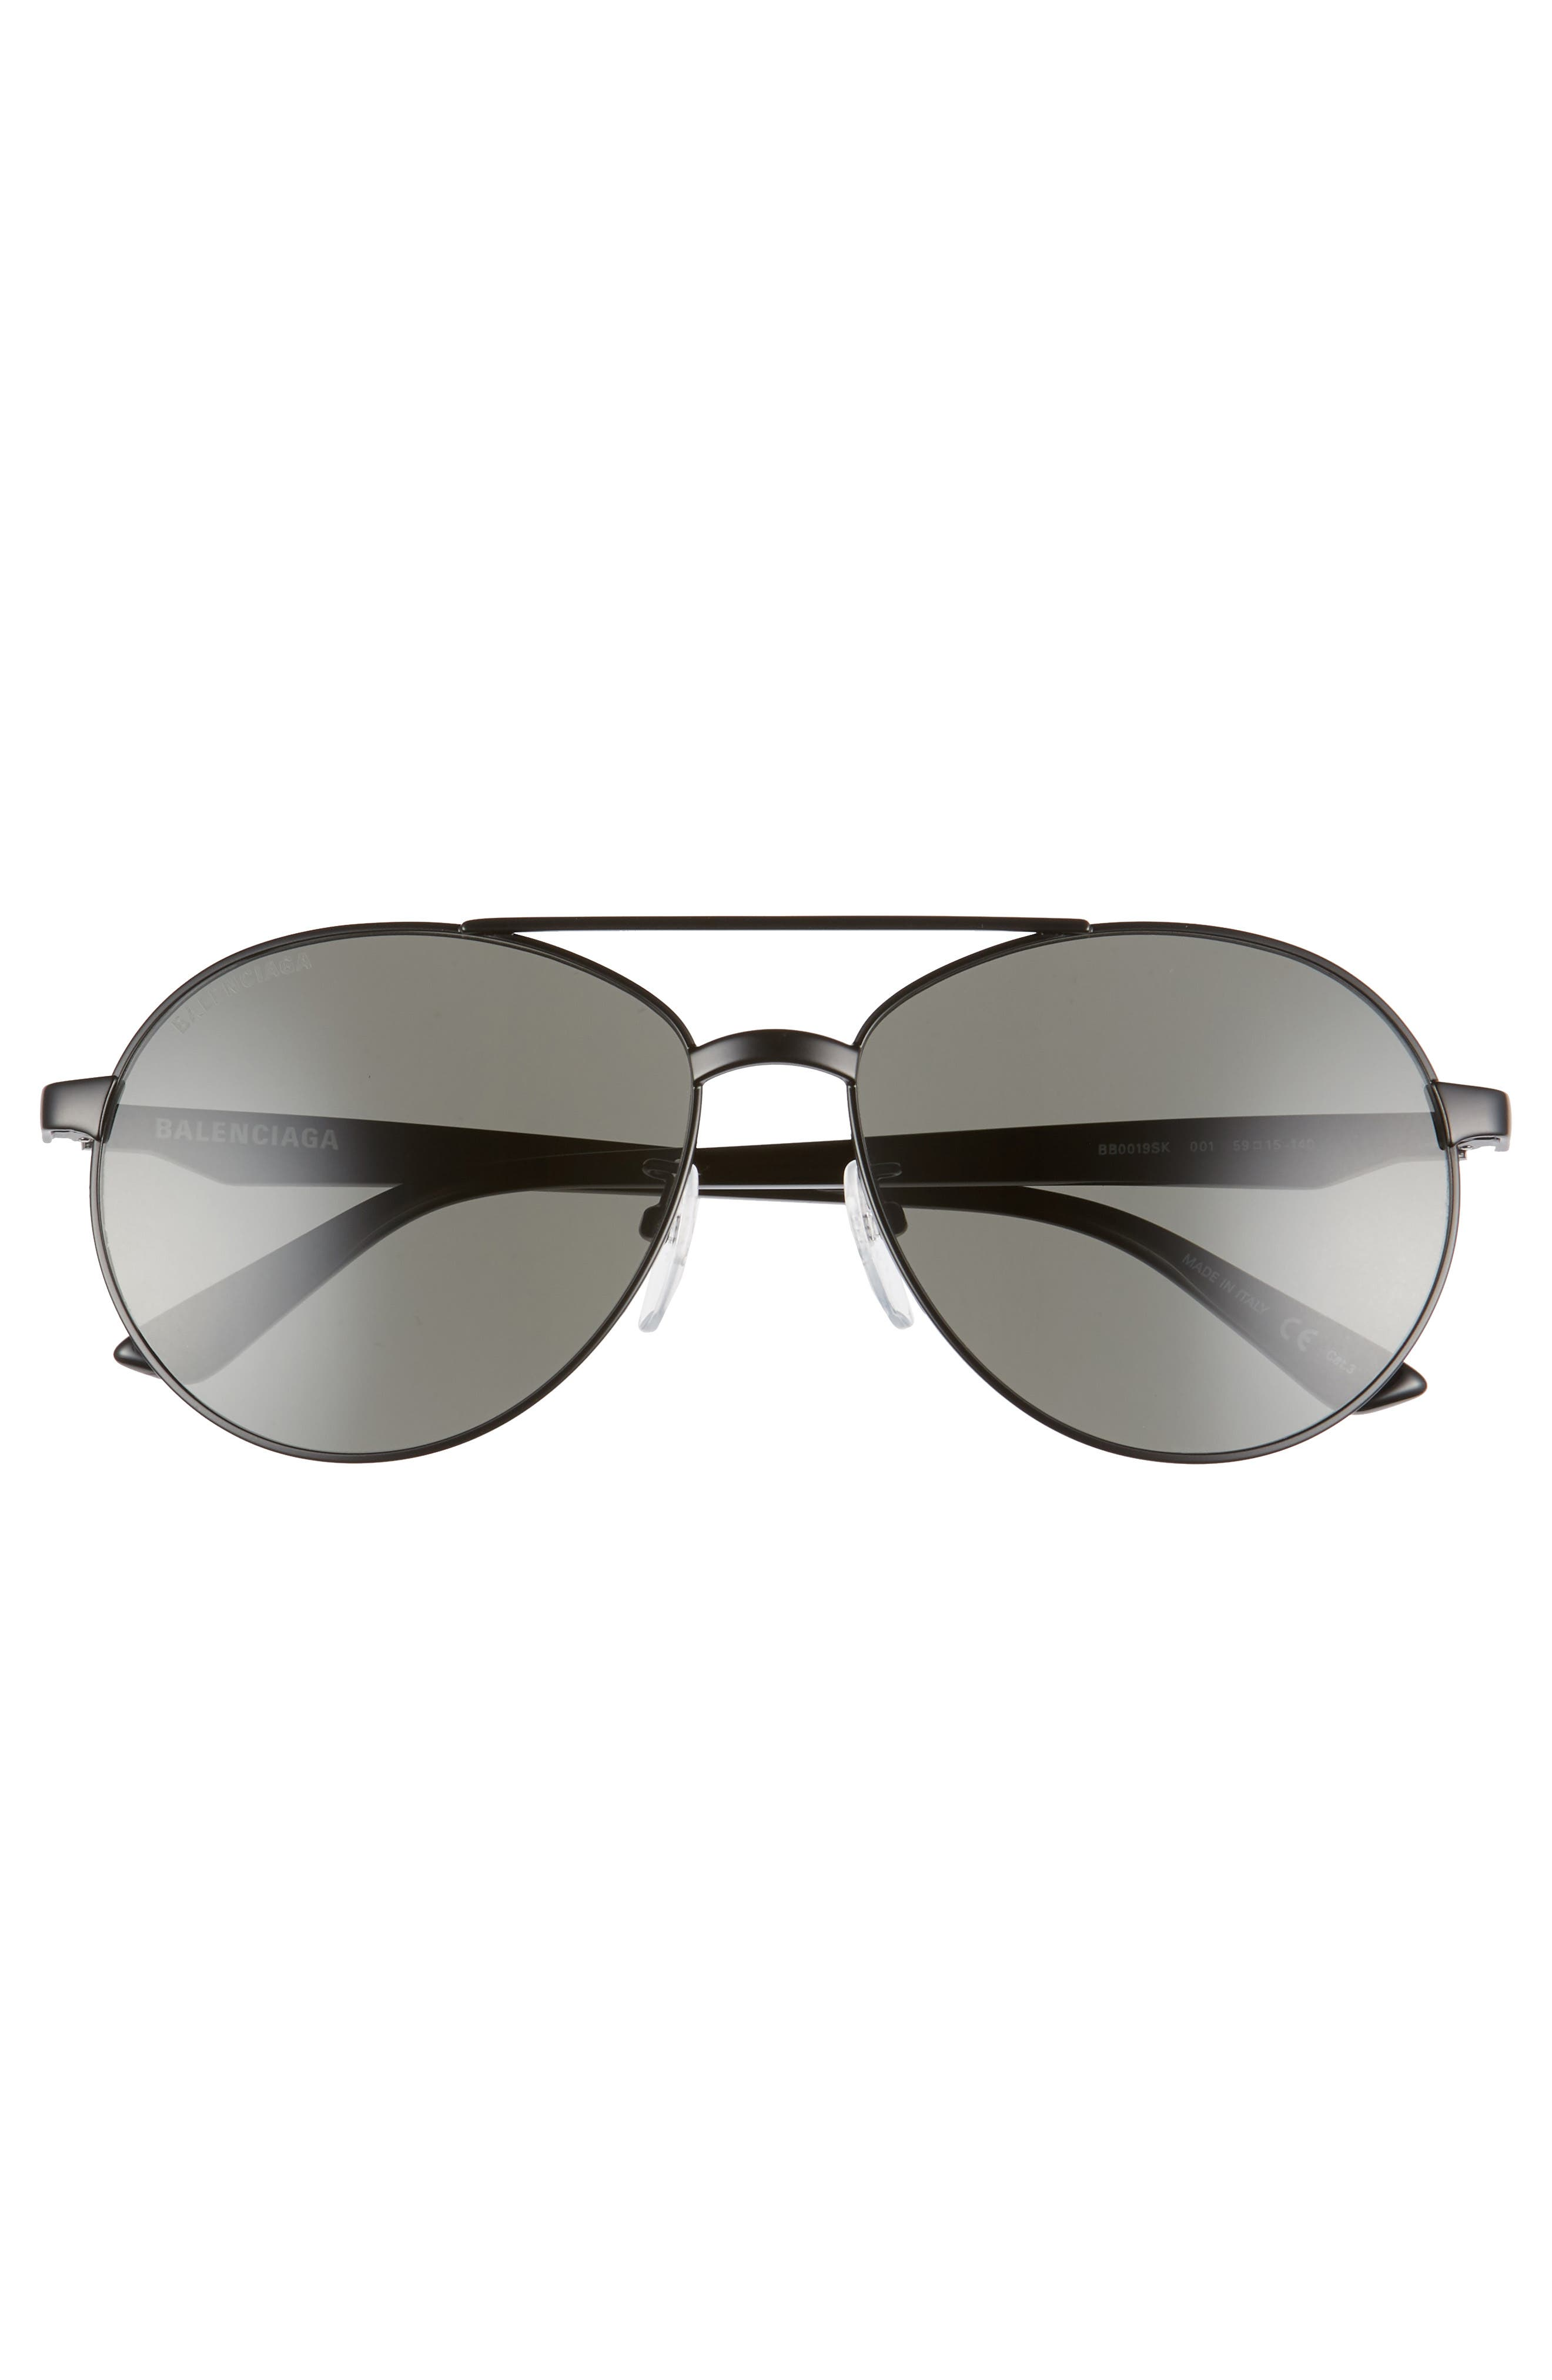 BALENCIAGA, 59mm Aviator Sunglasses, Alternate thumbnail 3, color, SEMI-MATTE BLACK/ GREY